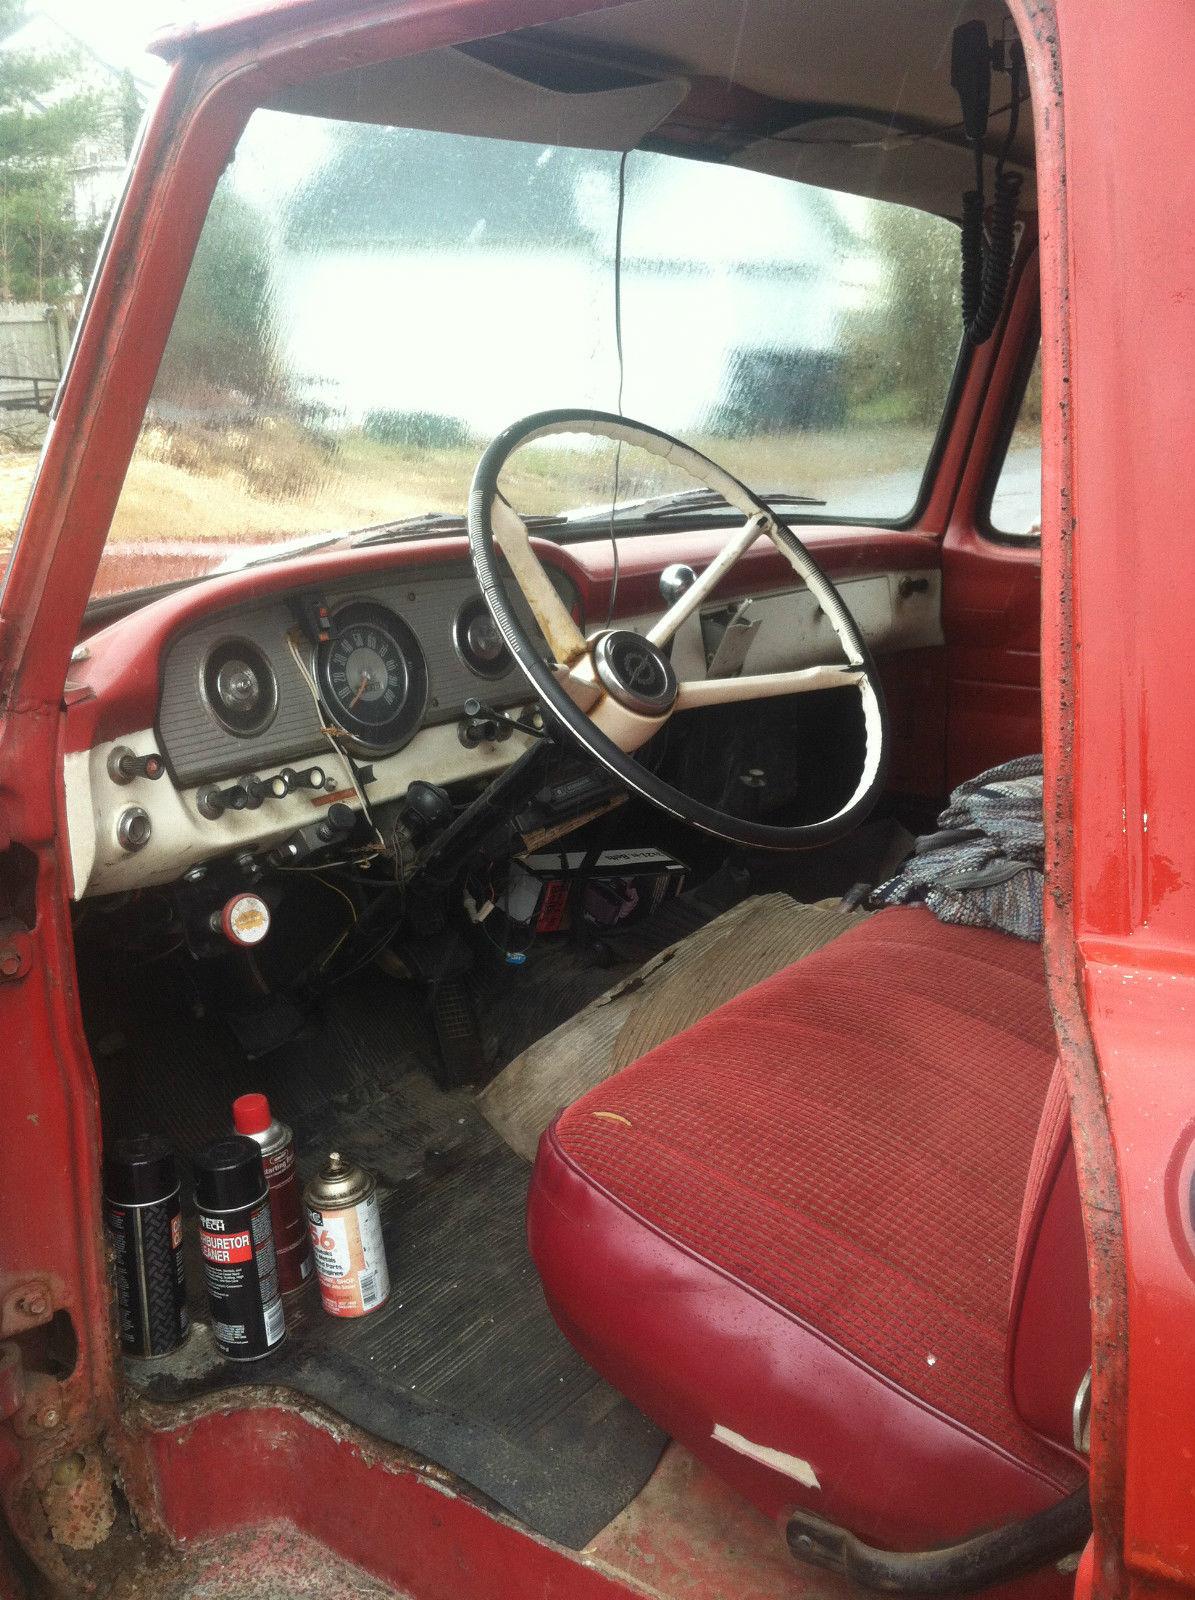 Antique 1964 Ford F 350 Dump Truck Vintage Retro Badass Clear Title 1955 F100 Steering Wheel Black Red